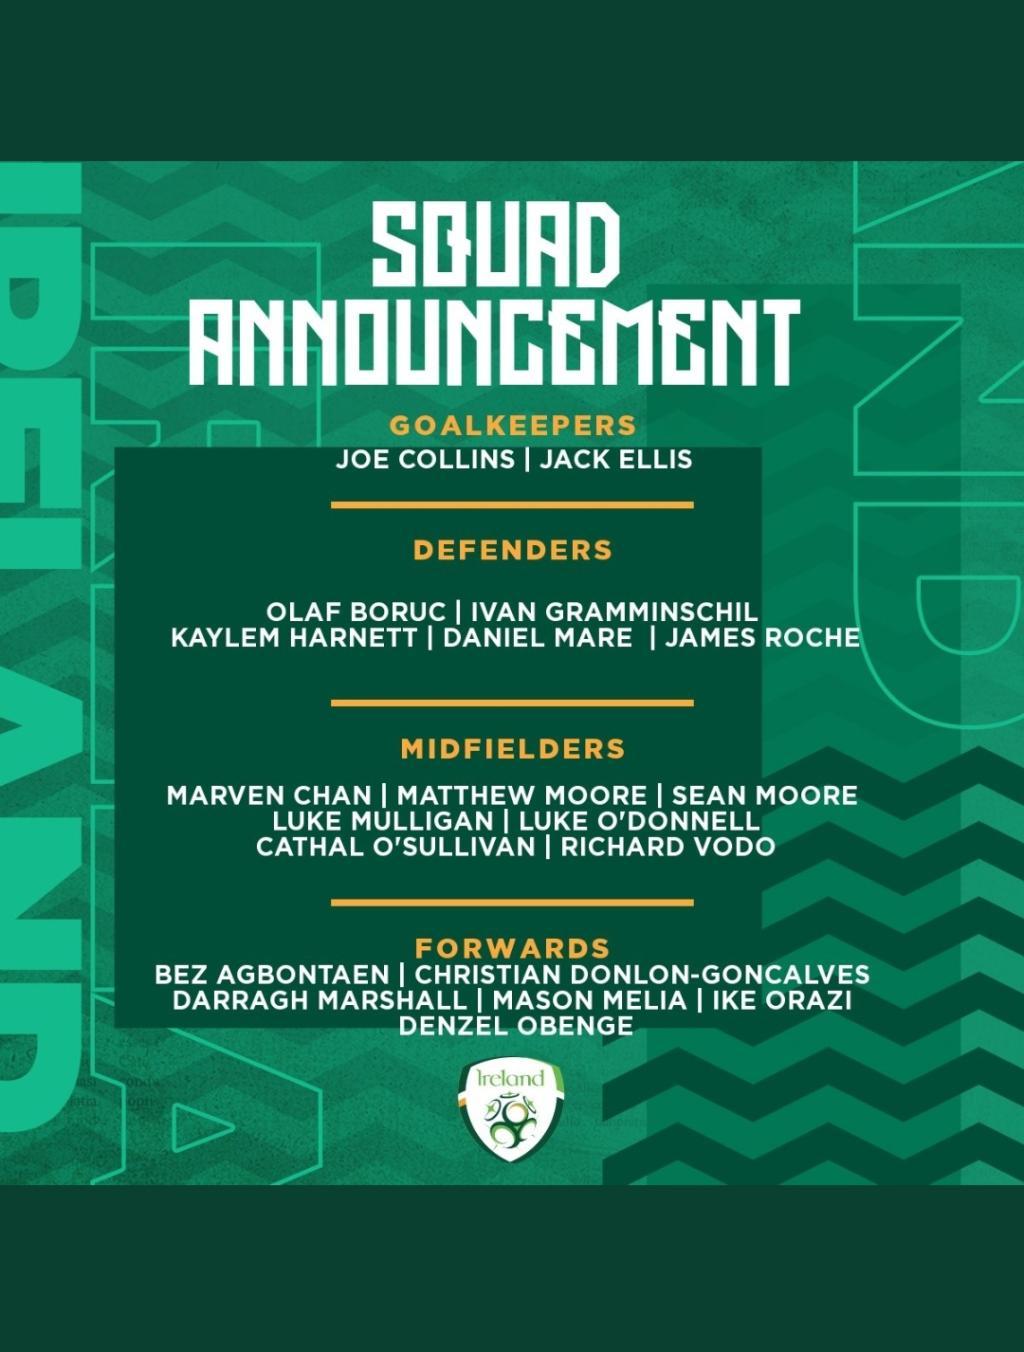 Denzel Obenge makes Irish u15 squad